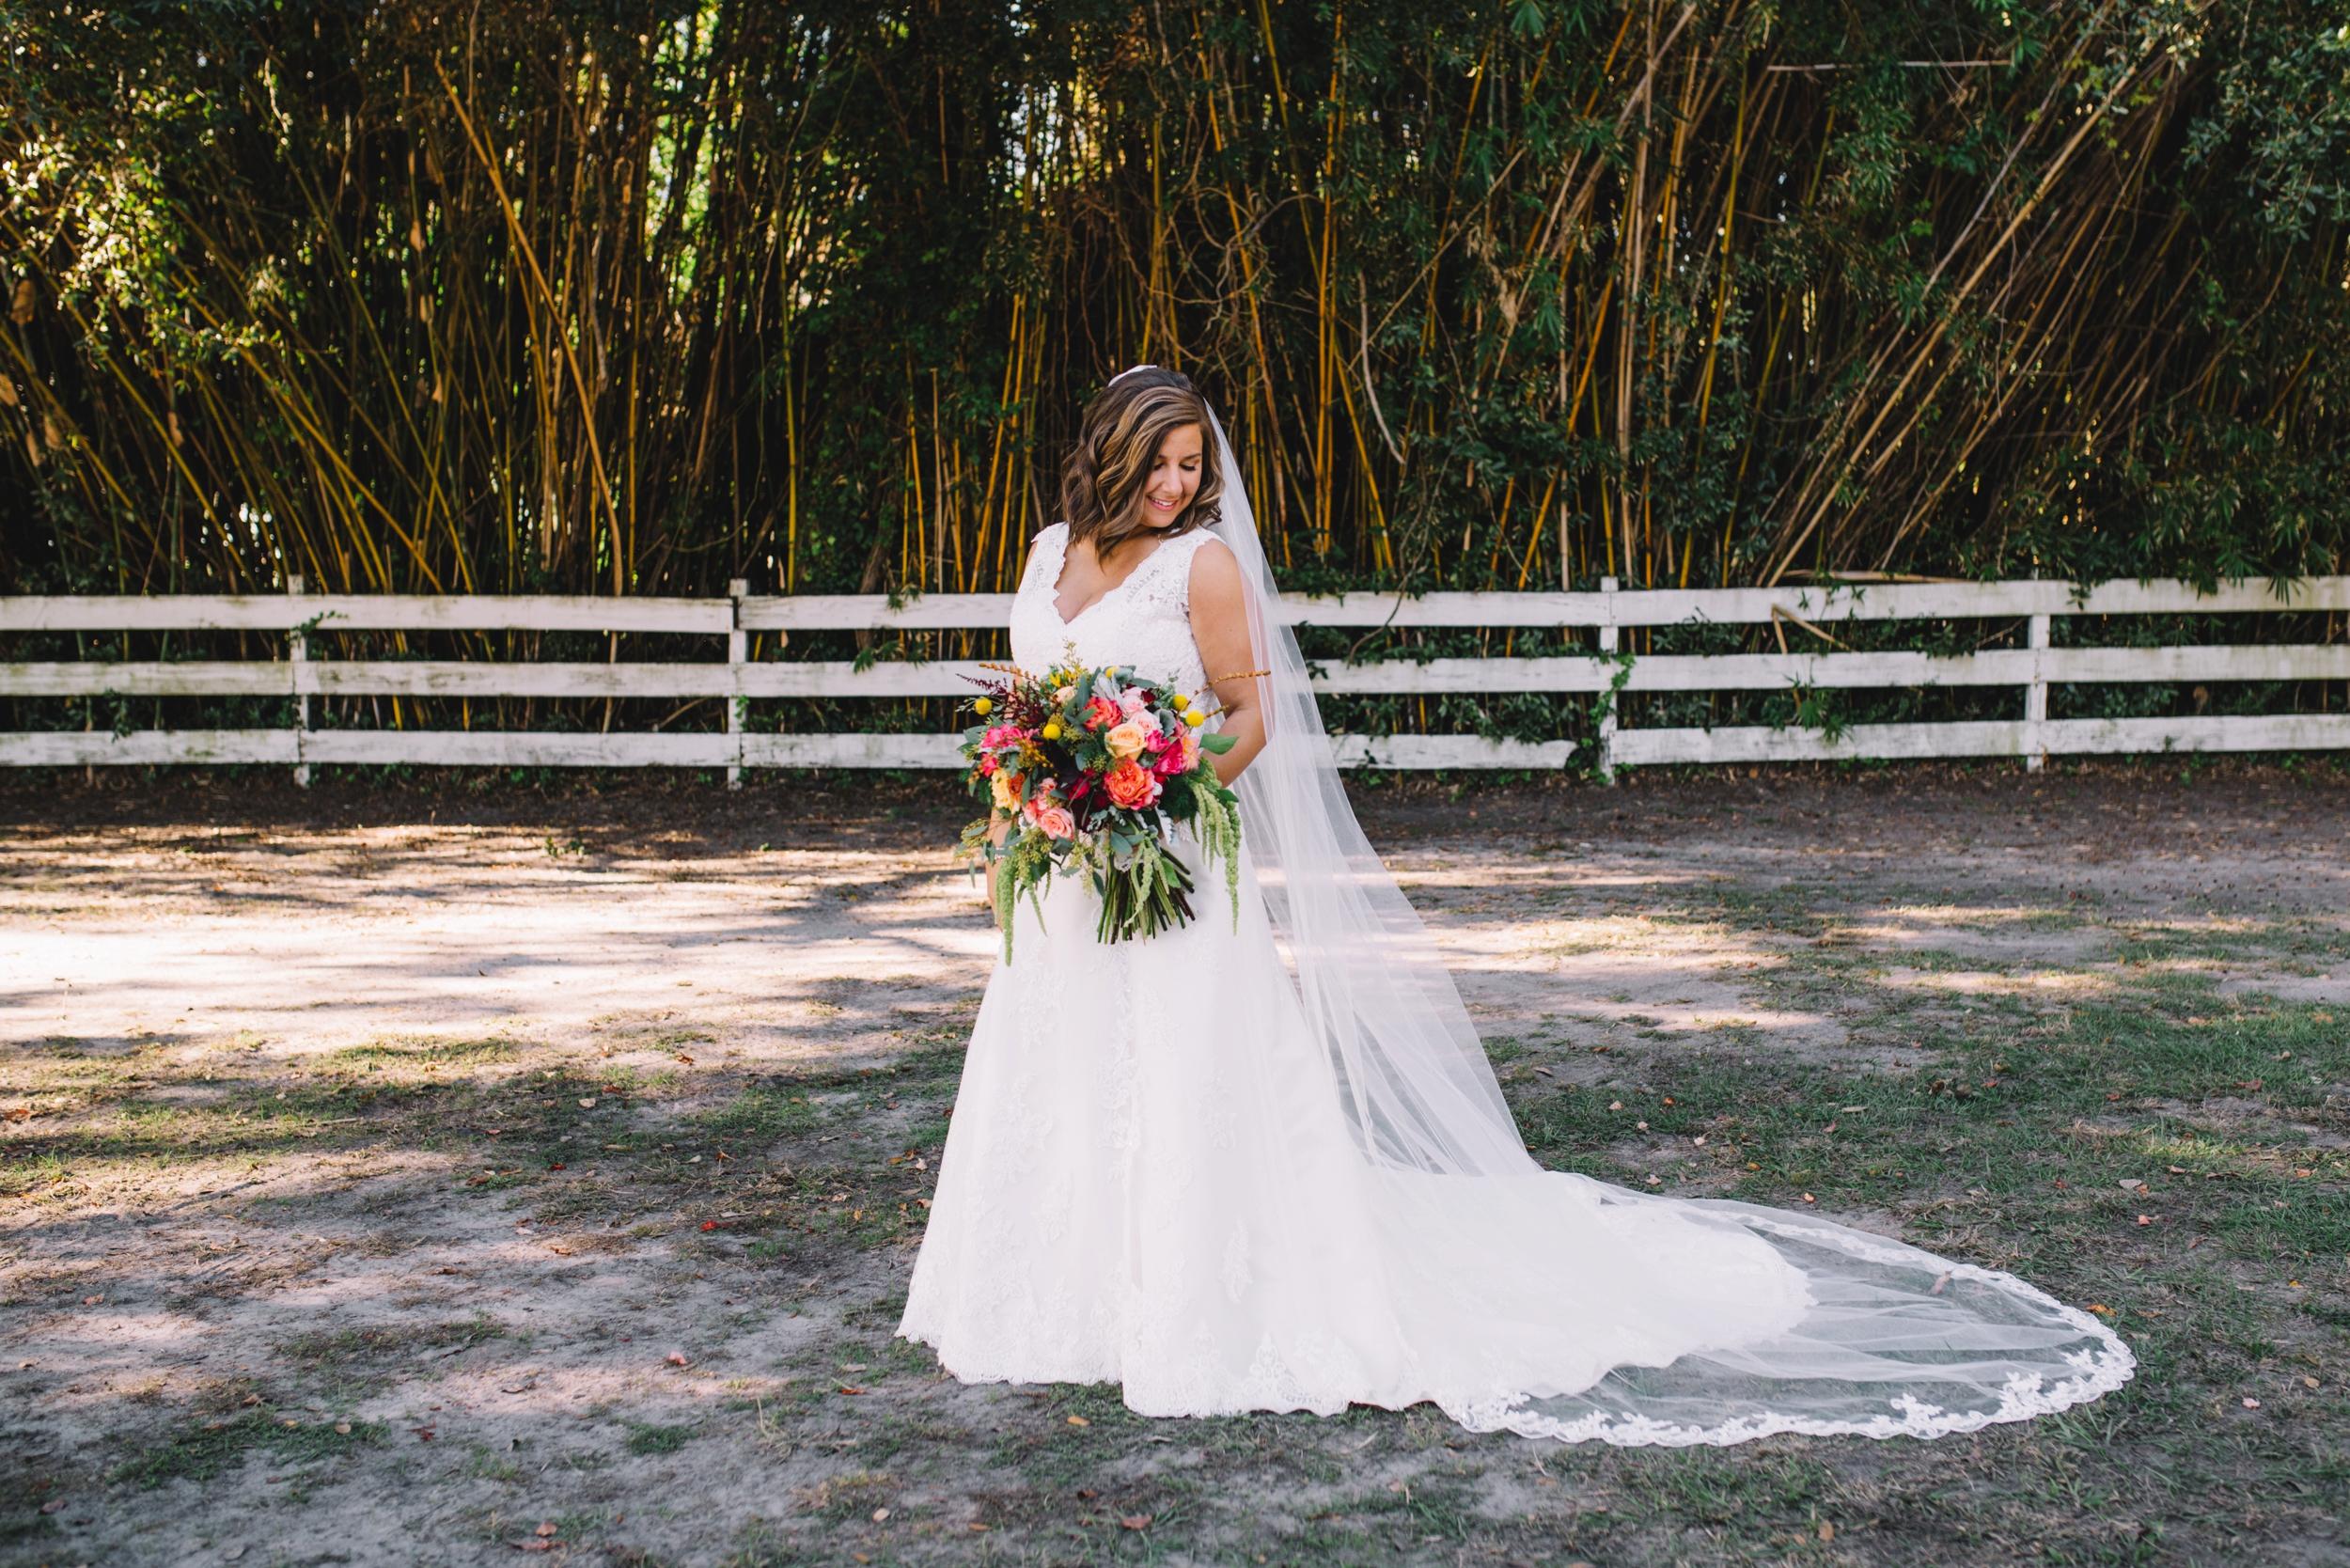 Charleston-wedding-photographer-34.jpg